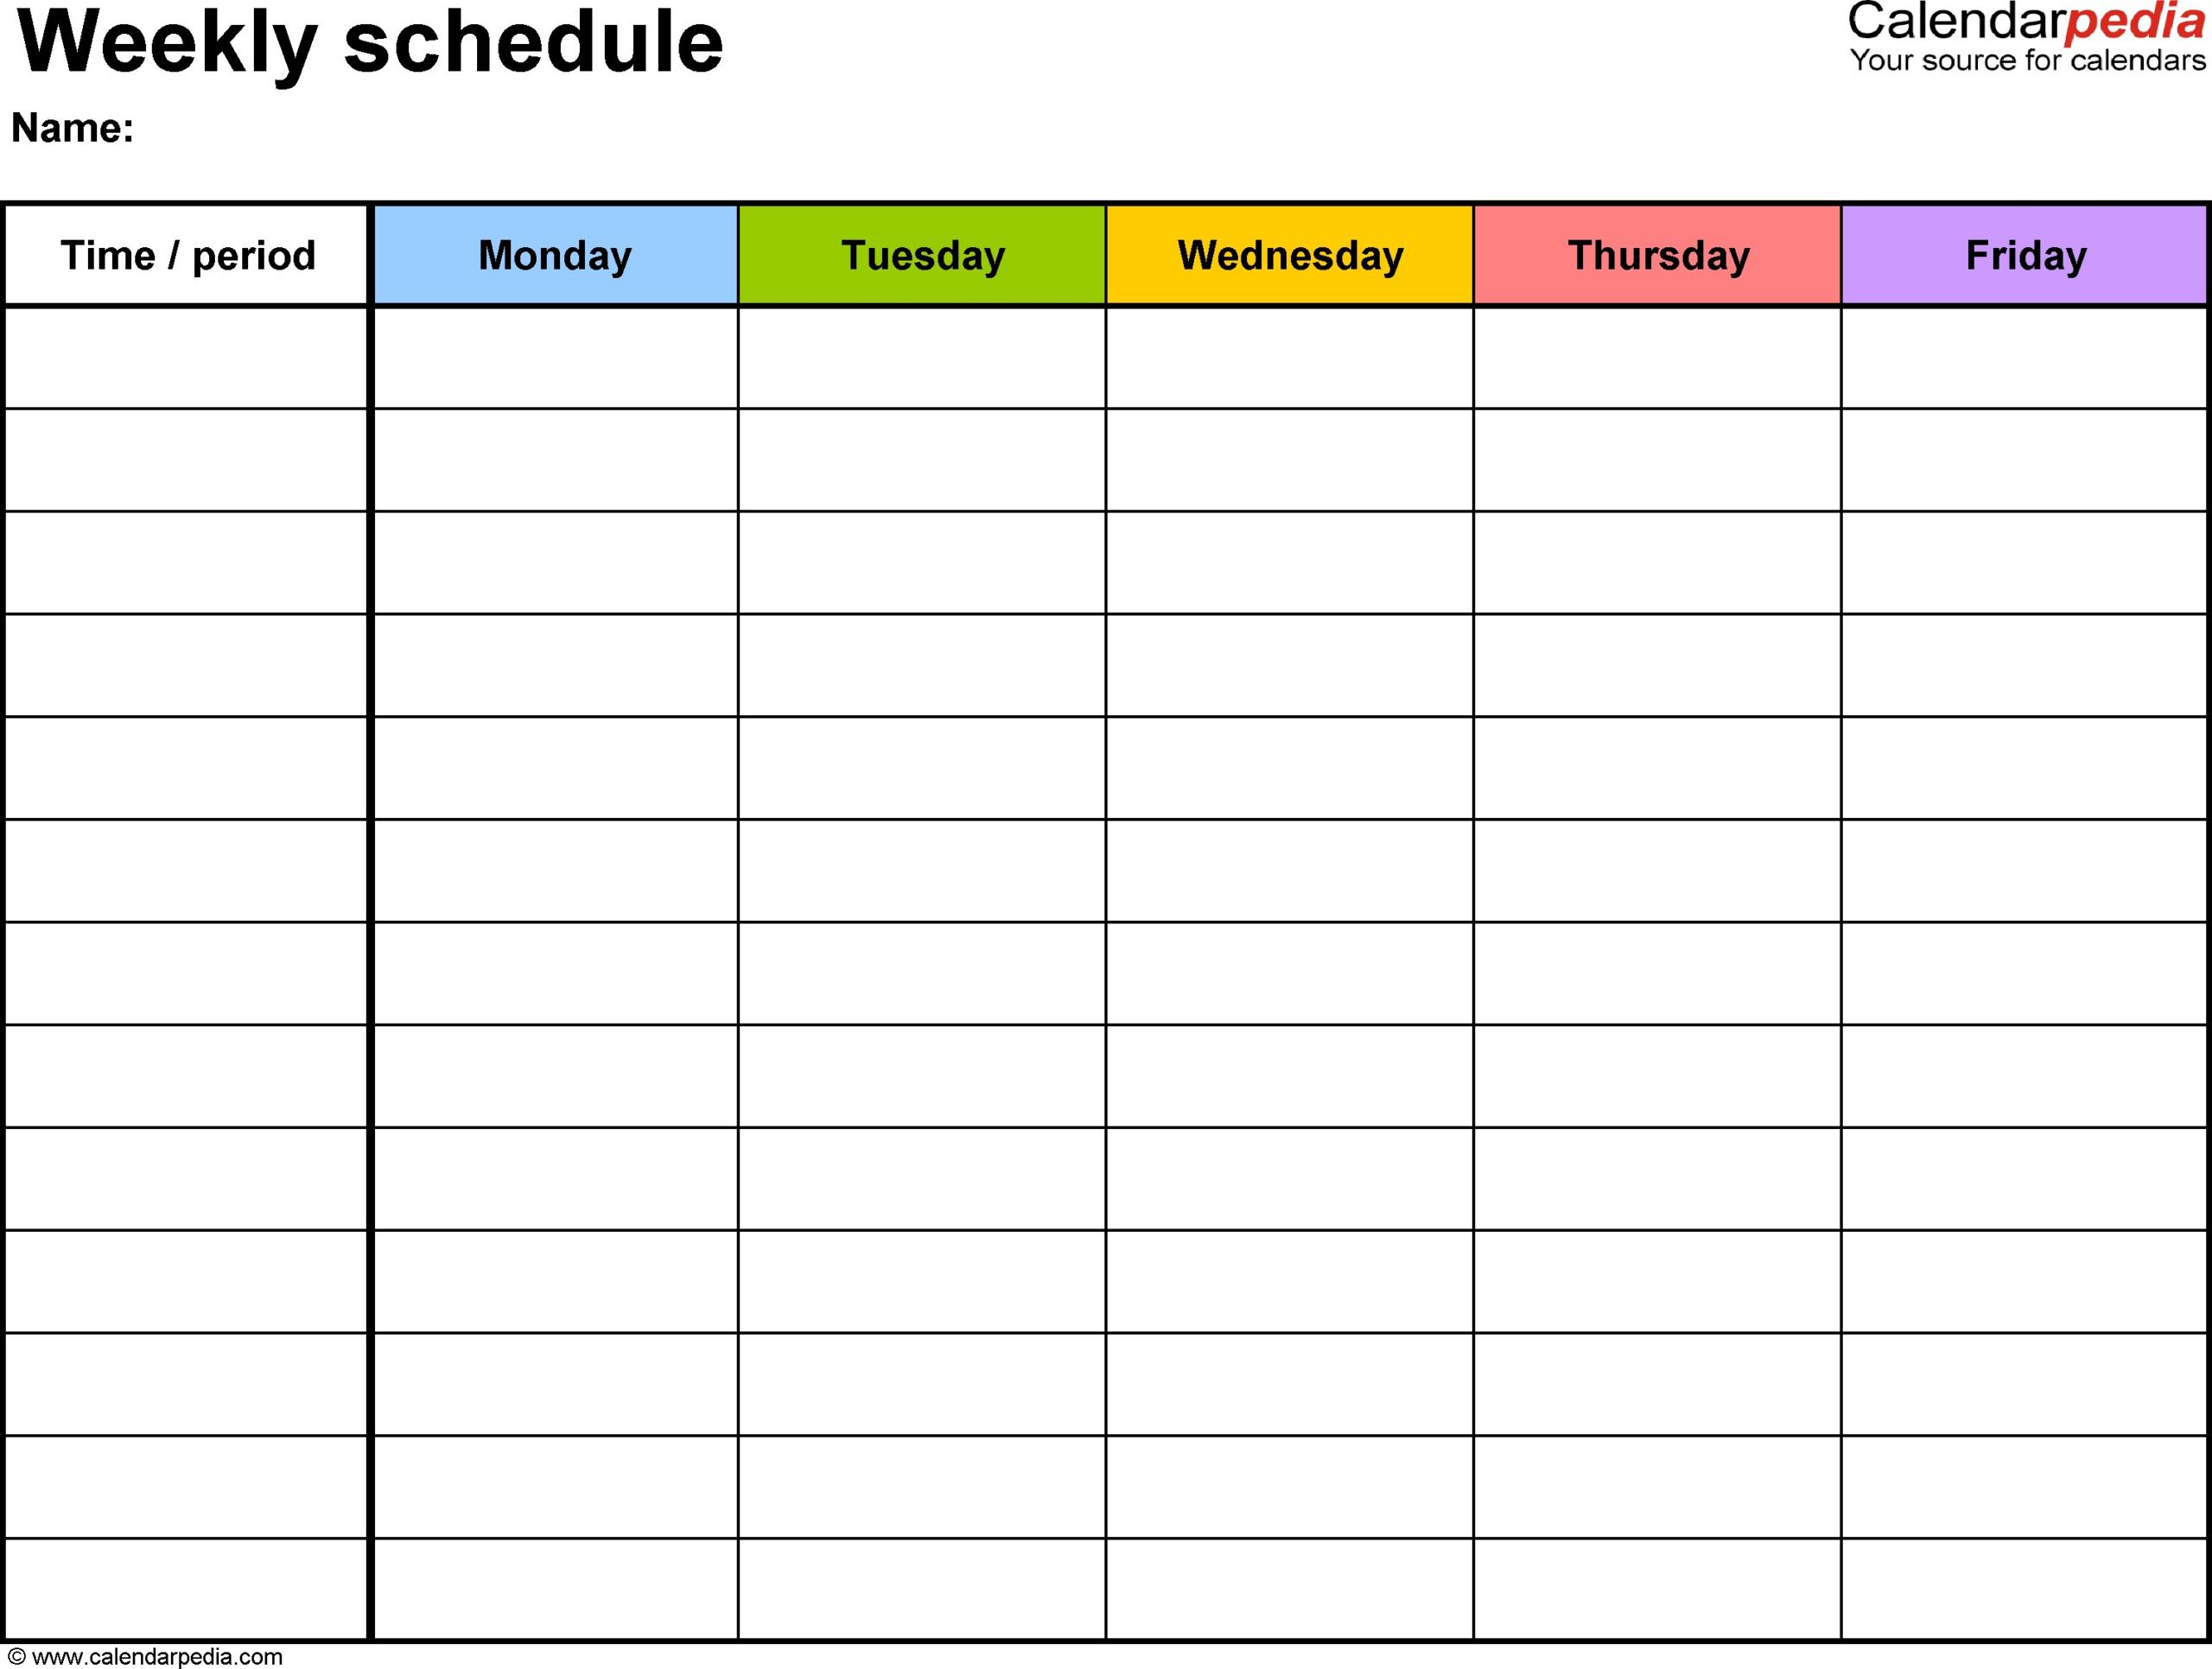 7 Day Employee Schedule Template  Calendar Inspiration Design within 7 Day Calendar Template